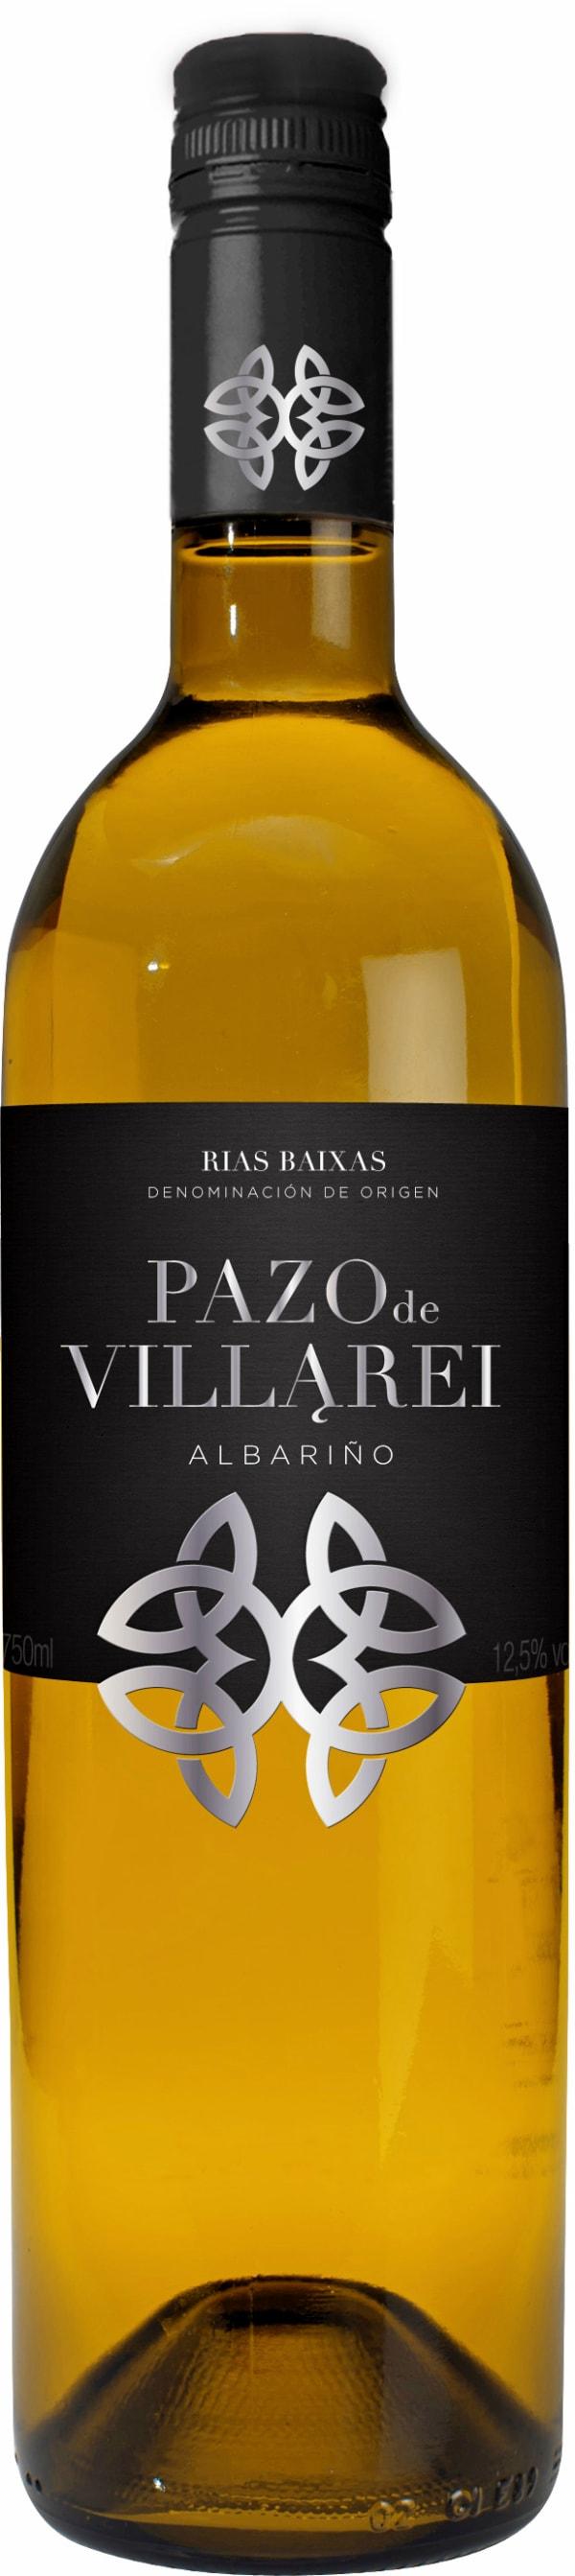 Pazo de Villarei Albariño 2020